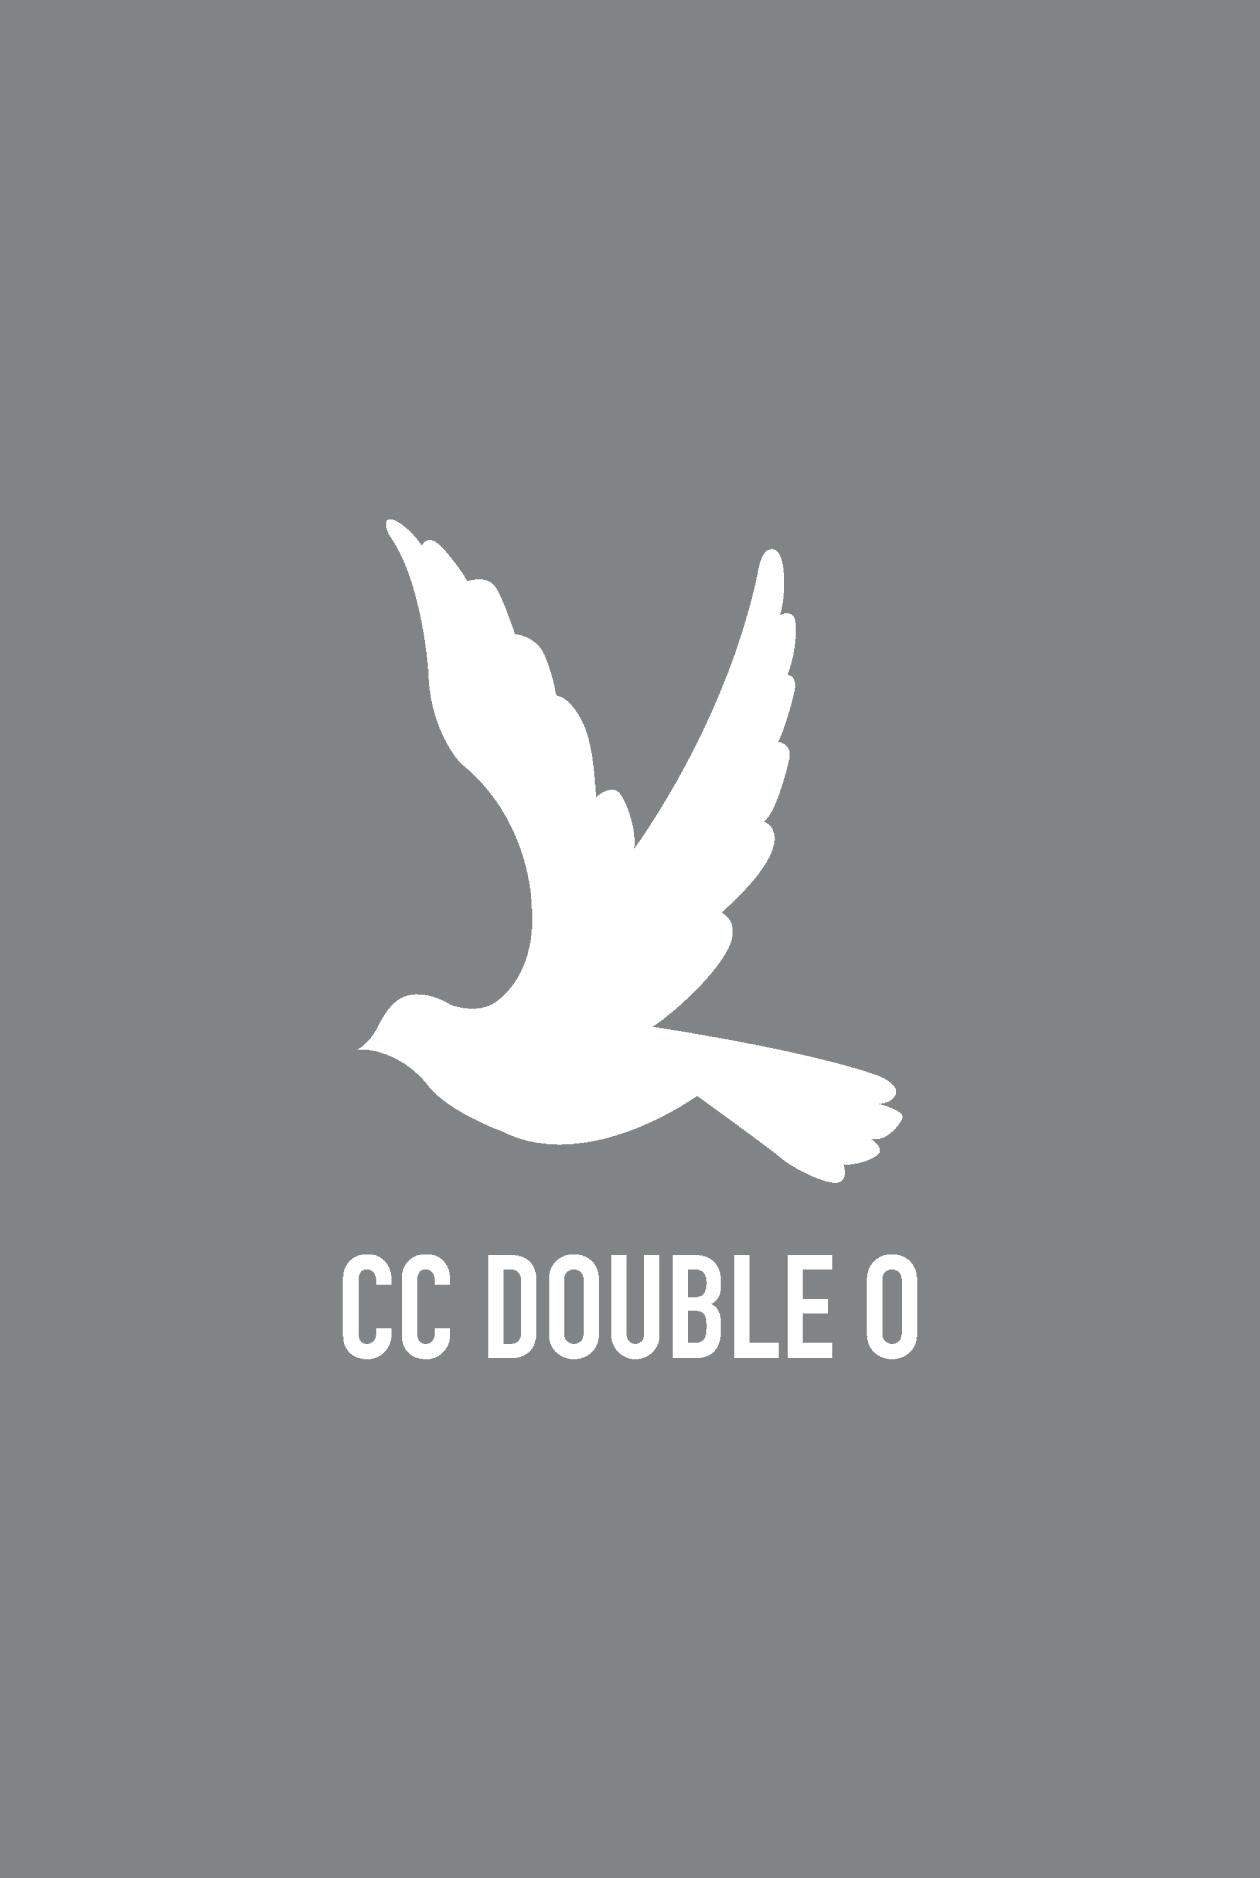 CC DOUBLE O LOGO BIFOLD LEATHER WALLET